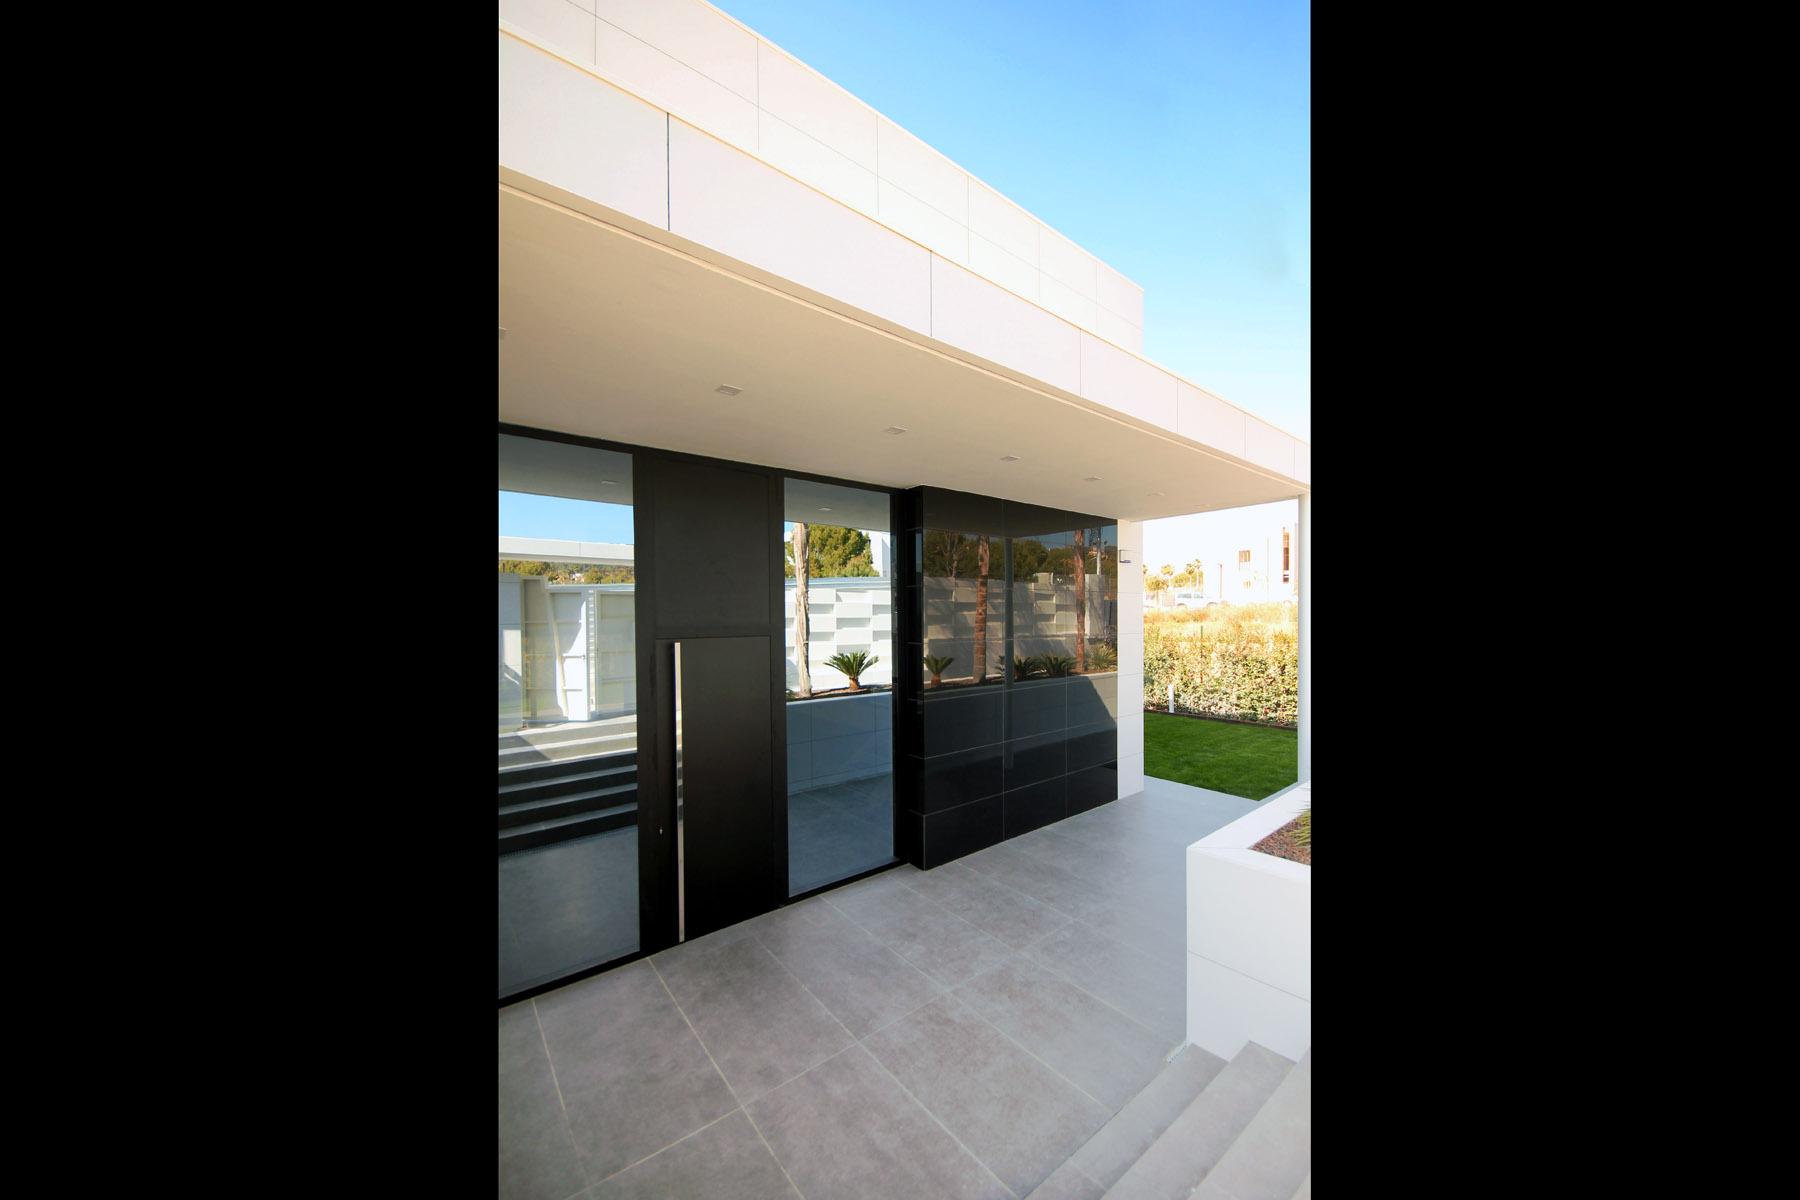 Vivienda-unifamiliar-aislada-en-la-plana-de-sitges-barcelona-11